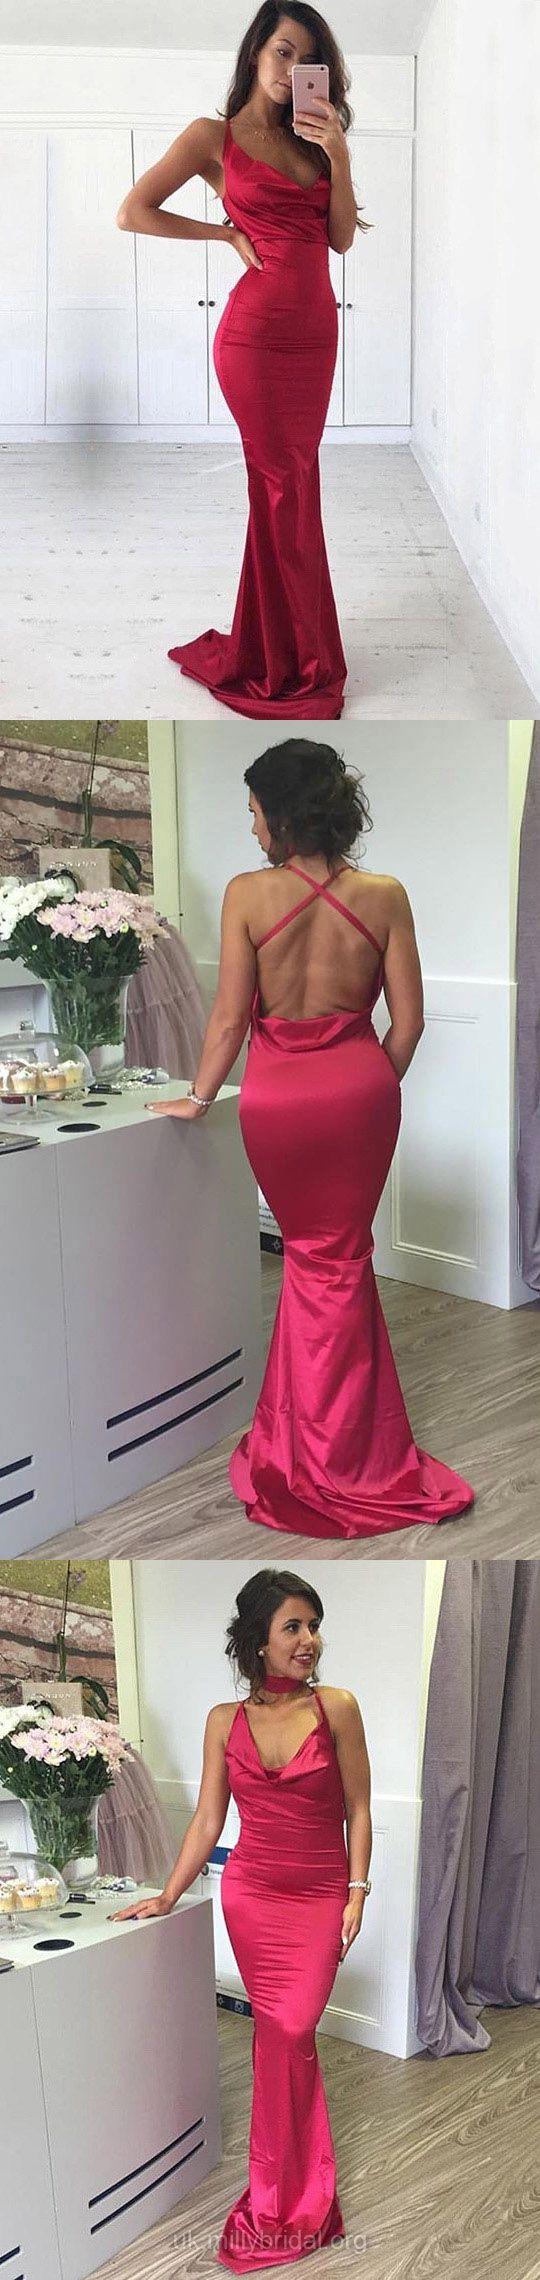 Red Prom Dresses, Long Prom Dresses, 2018 Prom Dresses For Teens, Silk-like Satin Prom Dresses Cowl Neck, Sheath/Column Prom Dresses For Girls